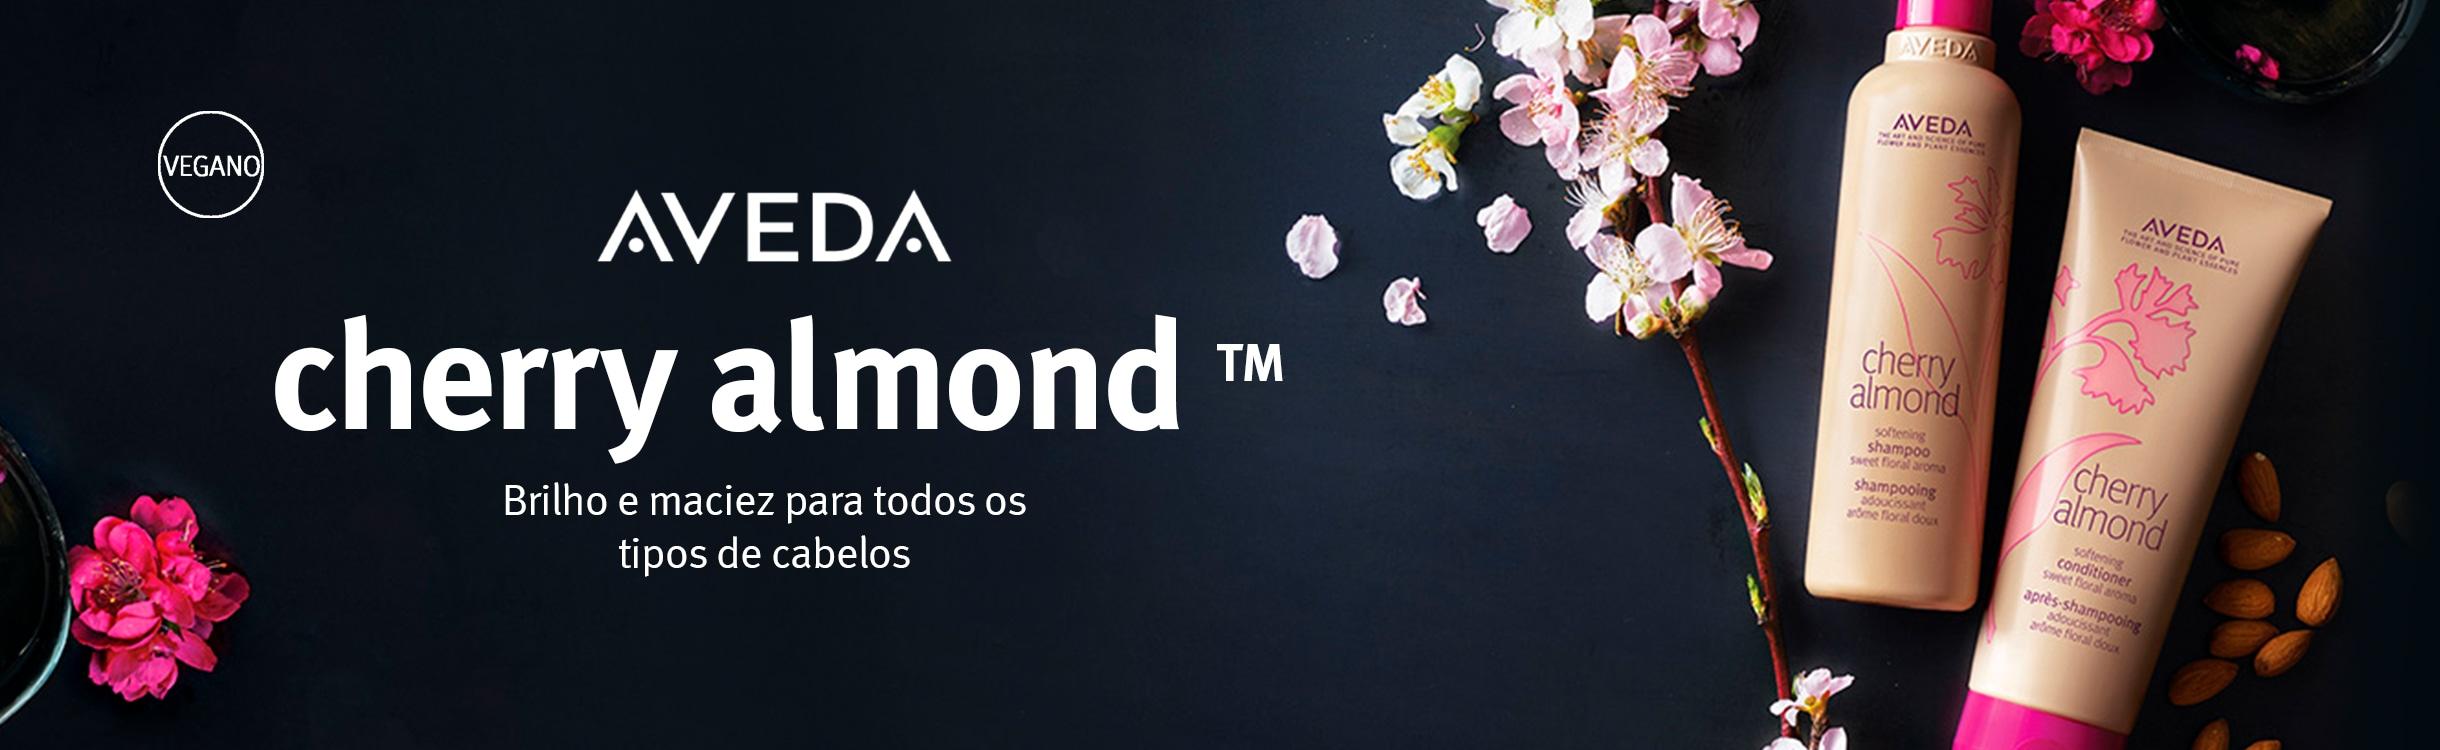 Aveda Cherry Almond